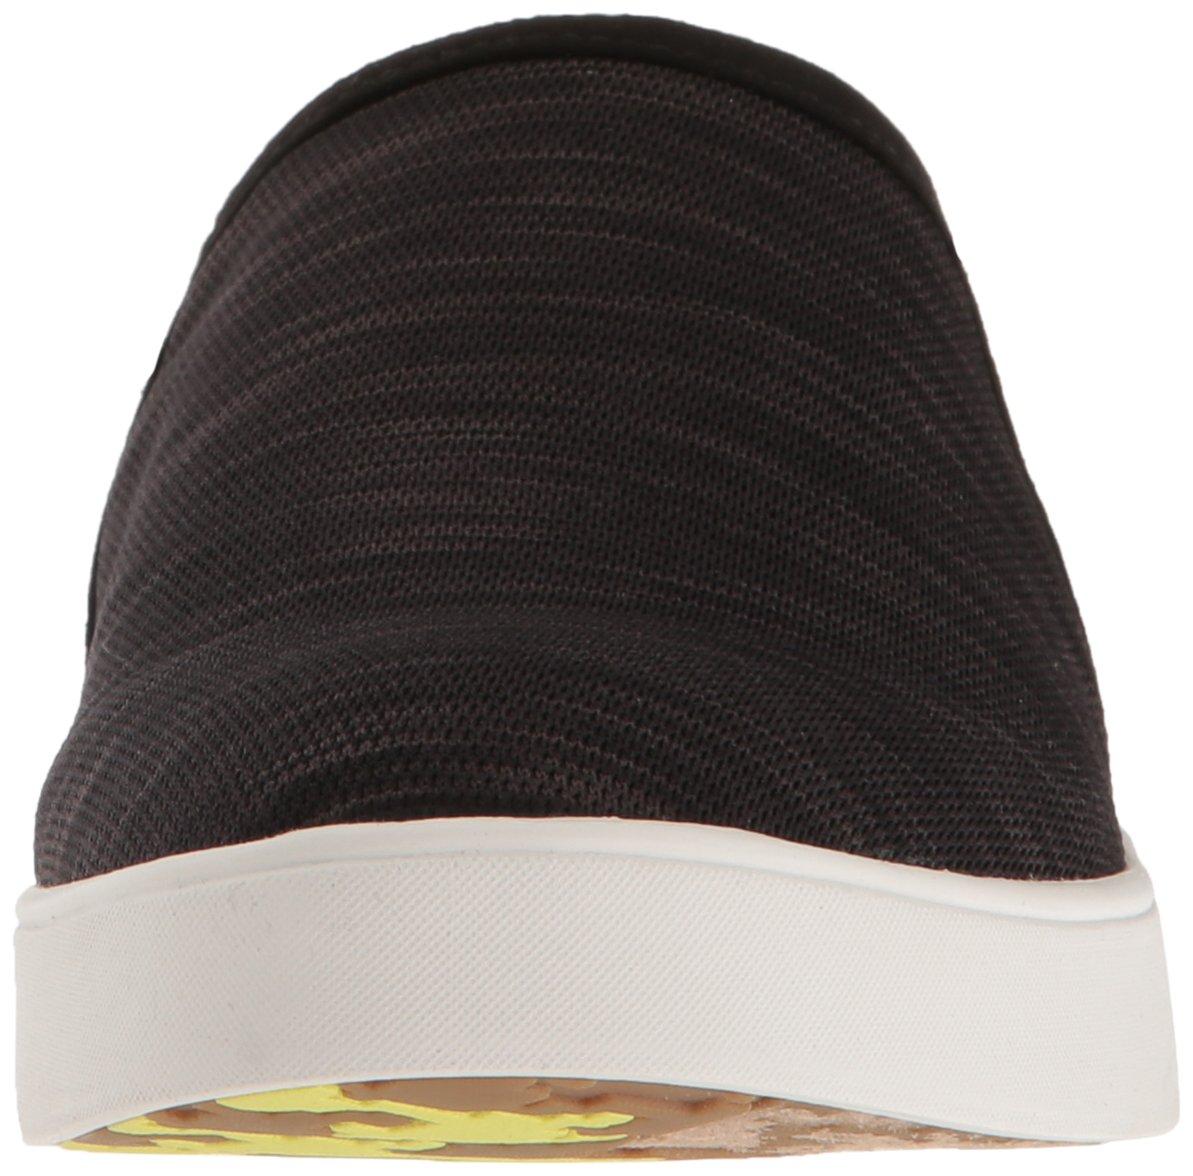 Dr. B01LX9F05Z Scholl's Women's Madi Mule Fashion Sneaker B01LX9F05Z Dr. 9 B(M) US|Black Aurora 837325